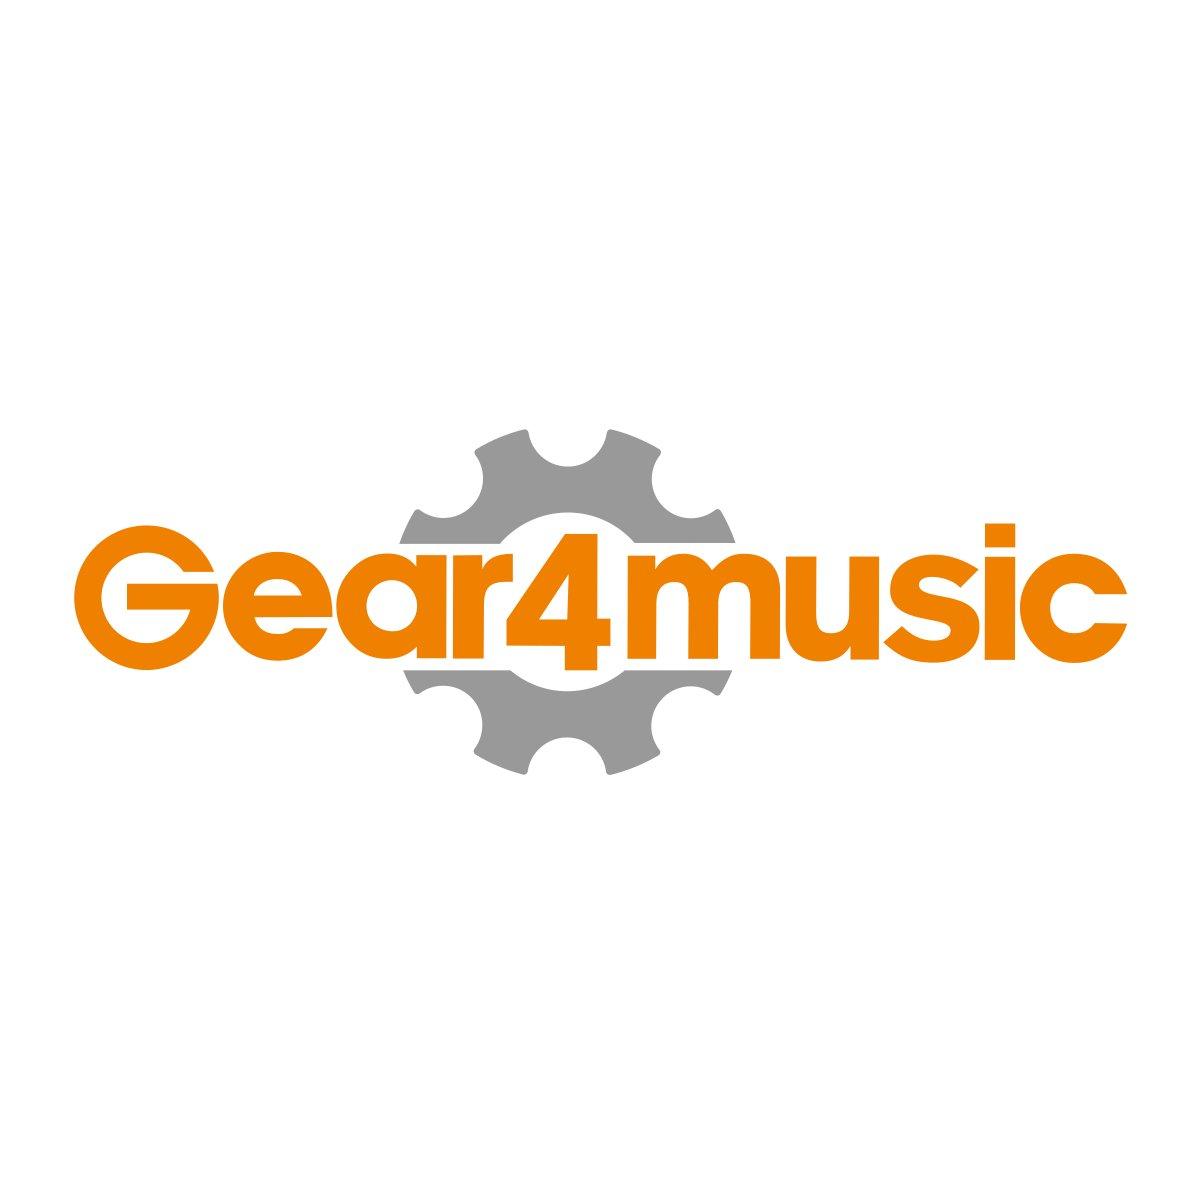 DP-10X Digitale Piano van Gear4music + Accessoireset, Wit